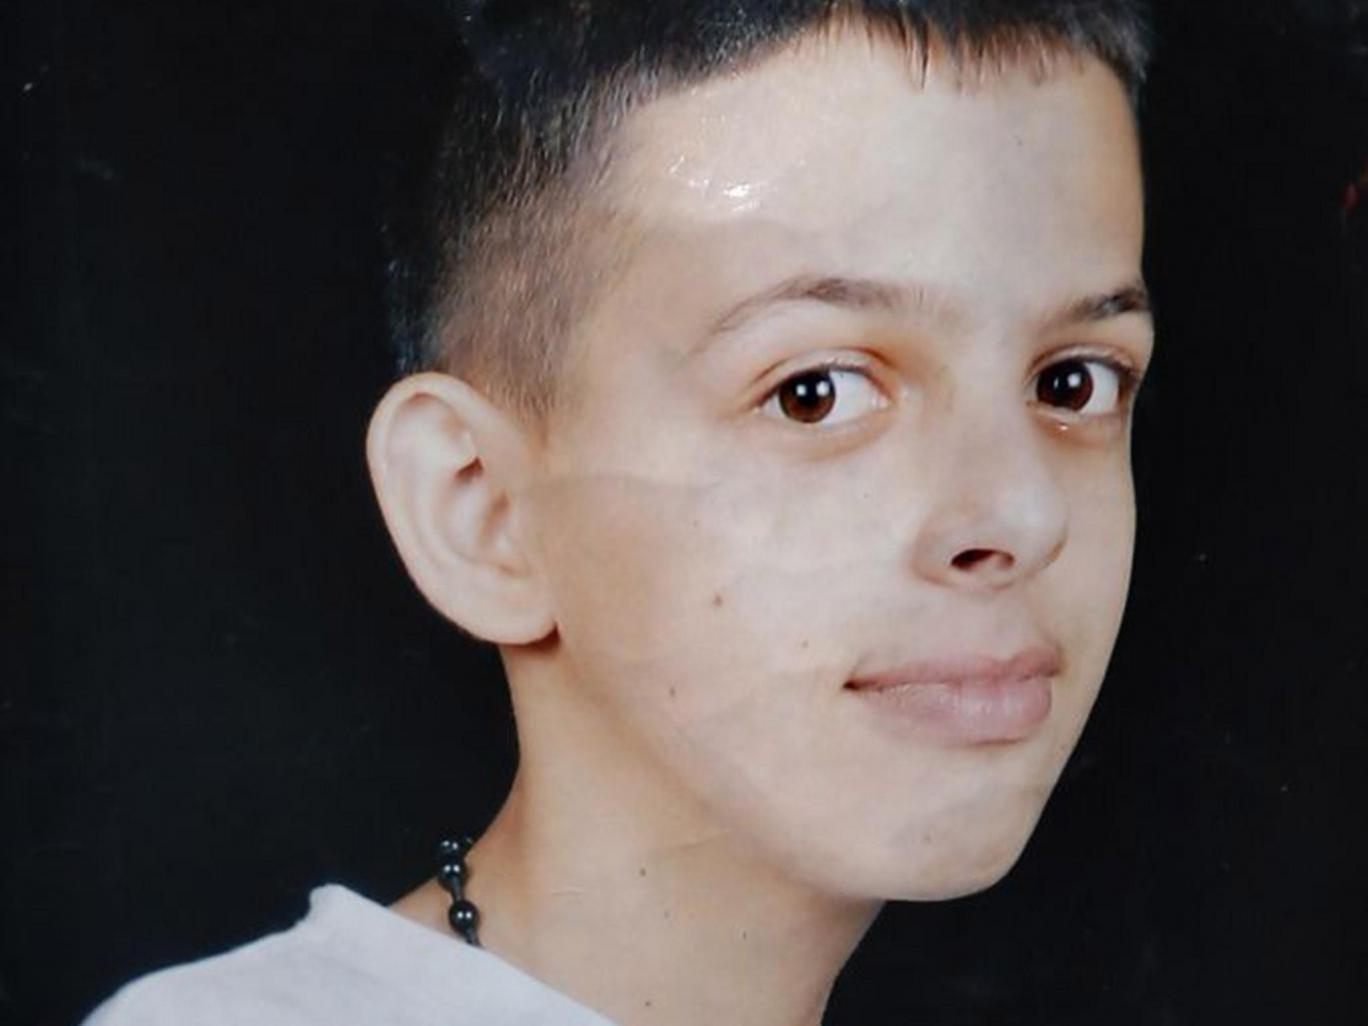 Mohammed Abu Khdeir, whose killing  sparked riots in Jerusalem last week